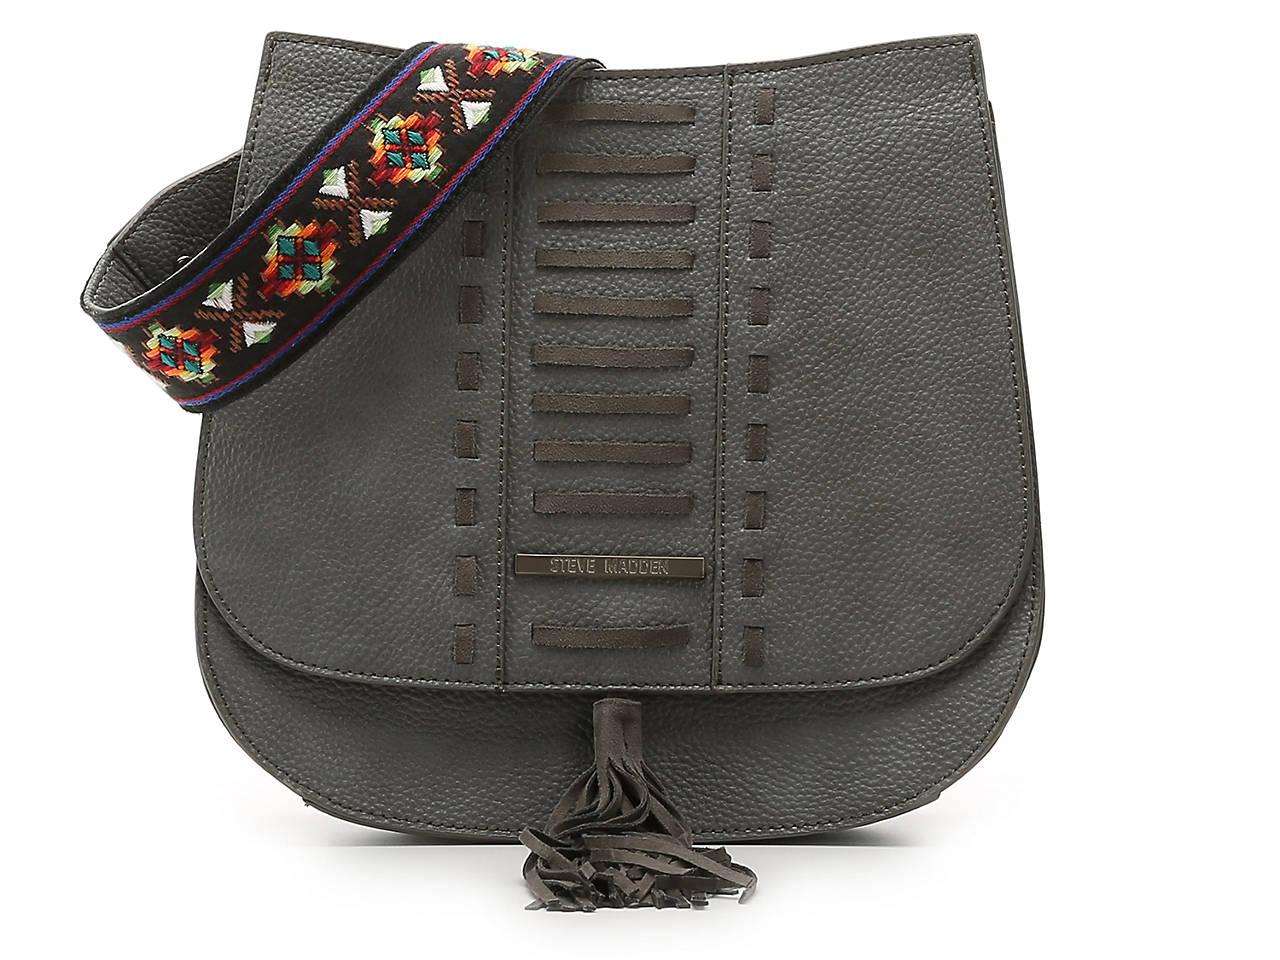 2c07897e3 Steve Madden Bslate Crossbody Bag Women's Handbags & Accessories | DSW